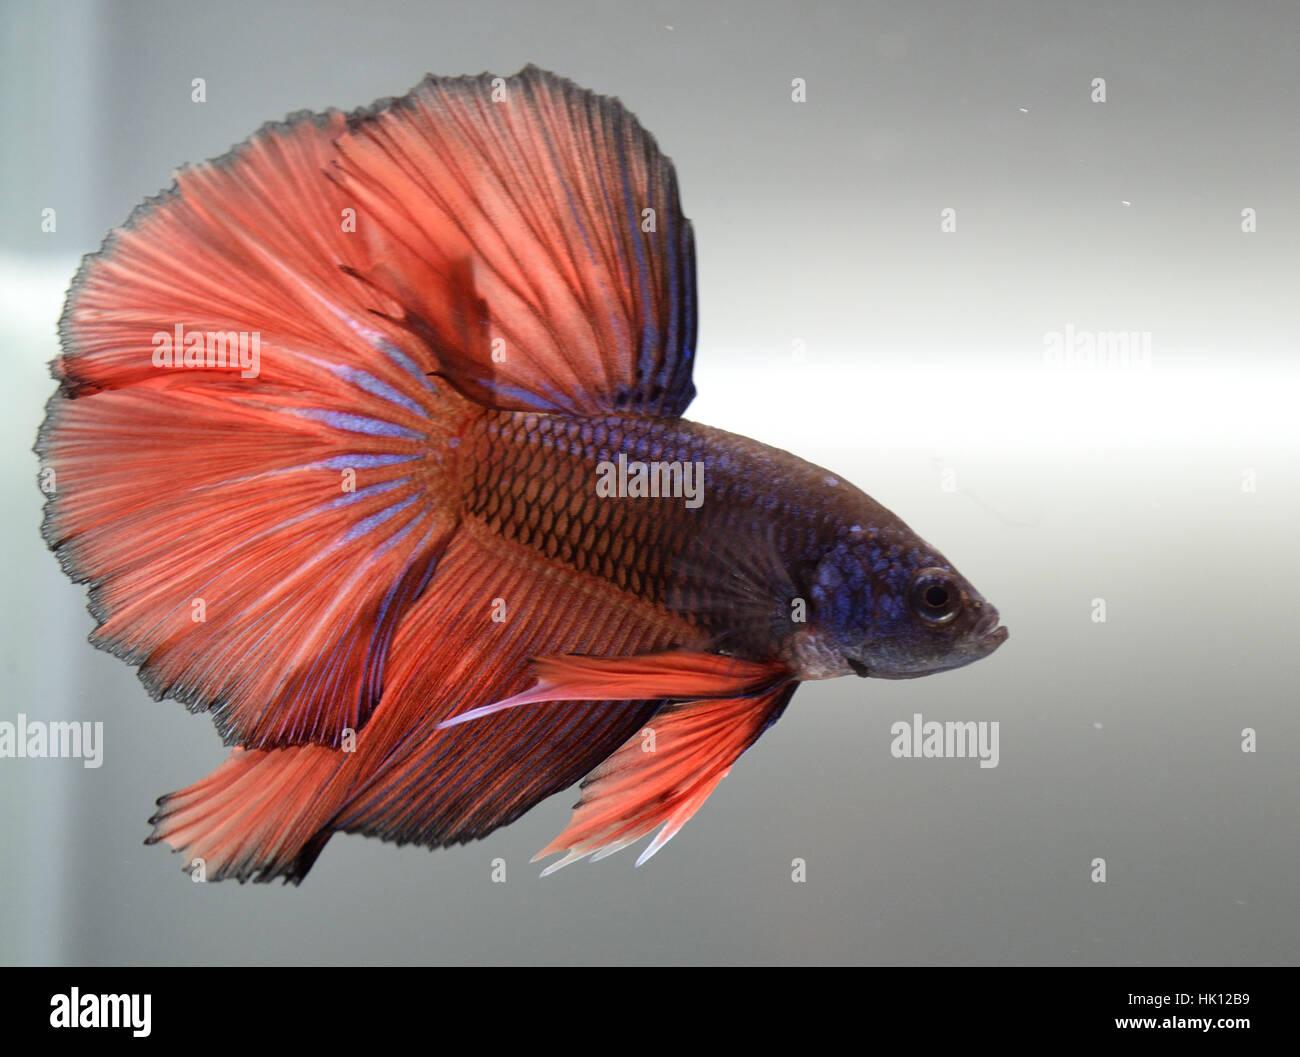 Orange Fish Fins Stock Photos & Orange Fish Fins Stock Images - Alamy